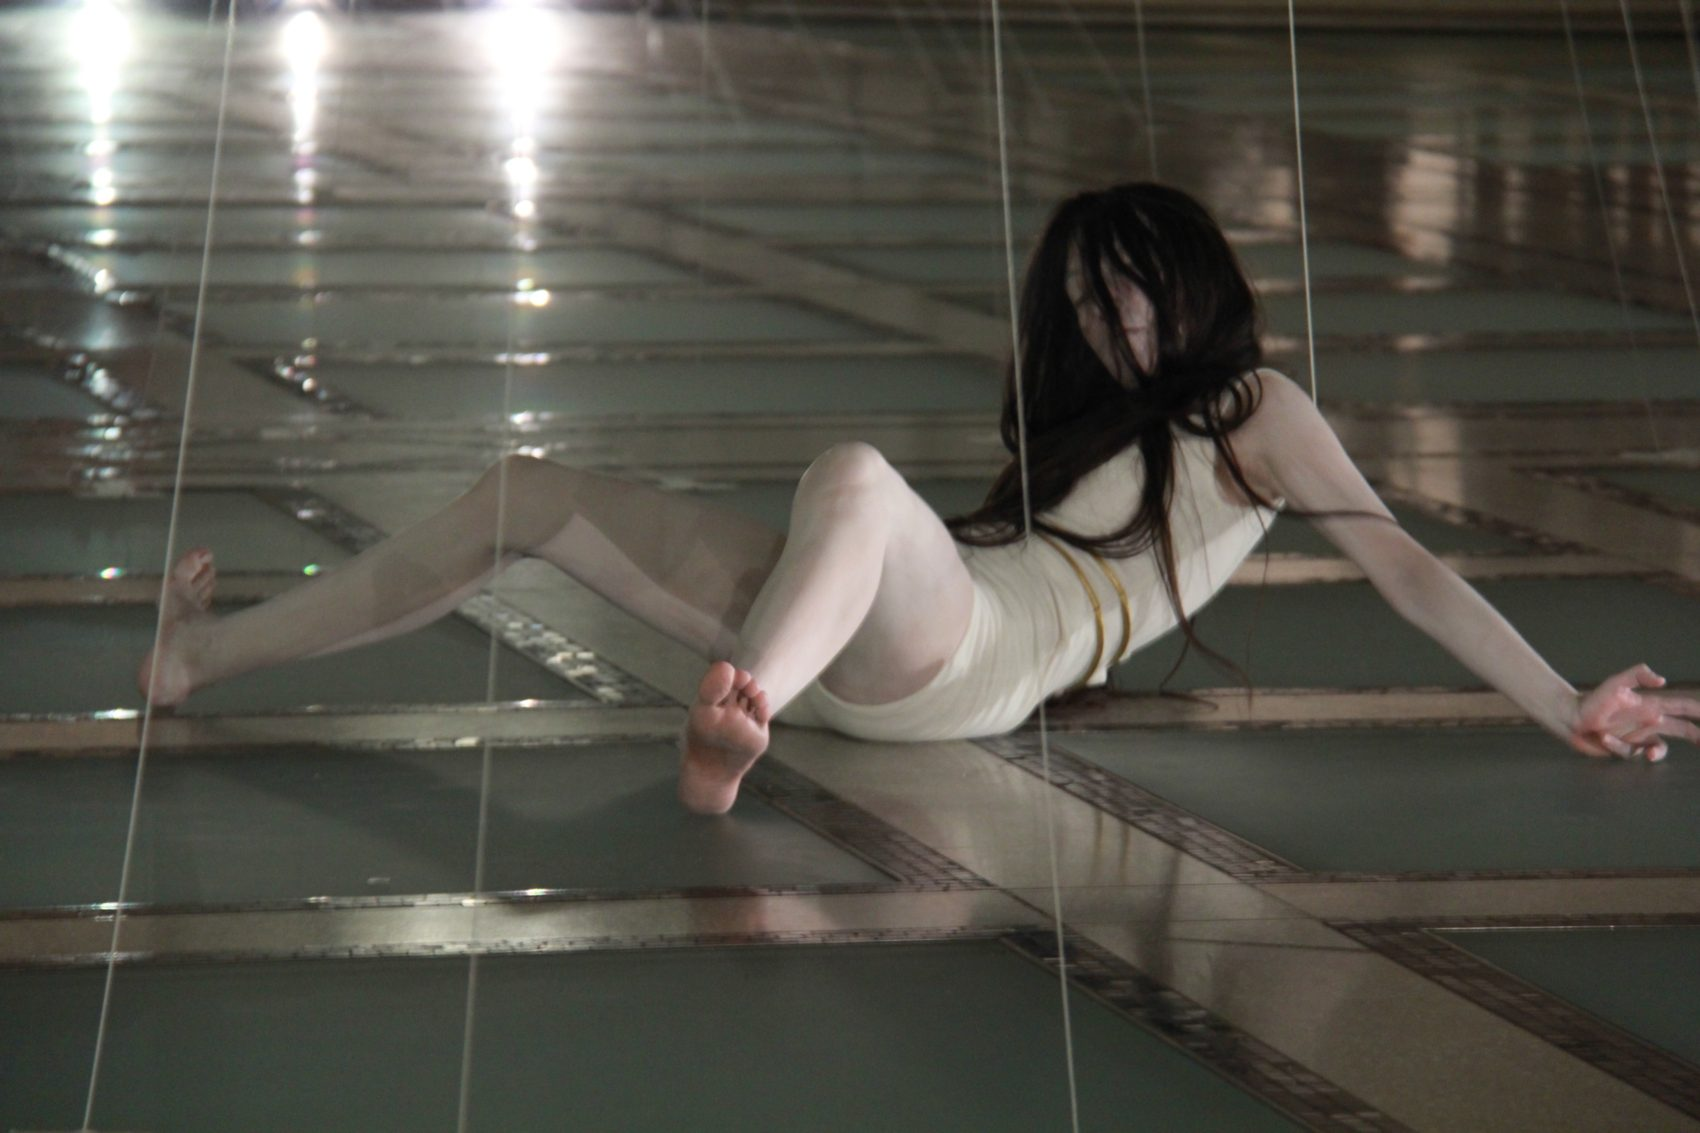 LEIMAY Holometaboly at Brooklyn Museum, September 11, 2014; Photos by Shige Moriya - 153